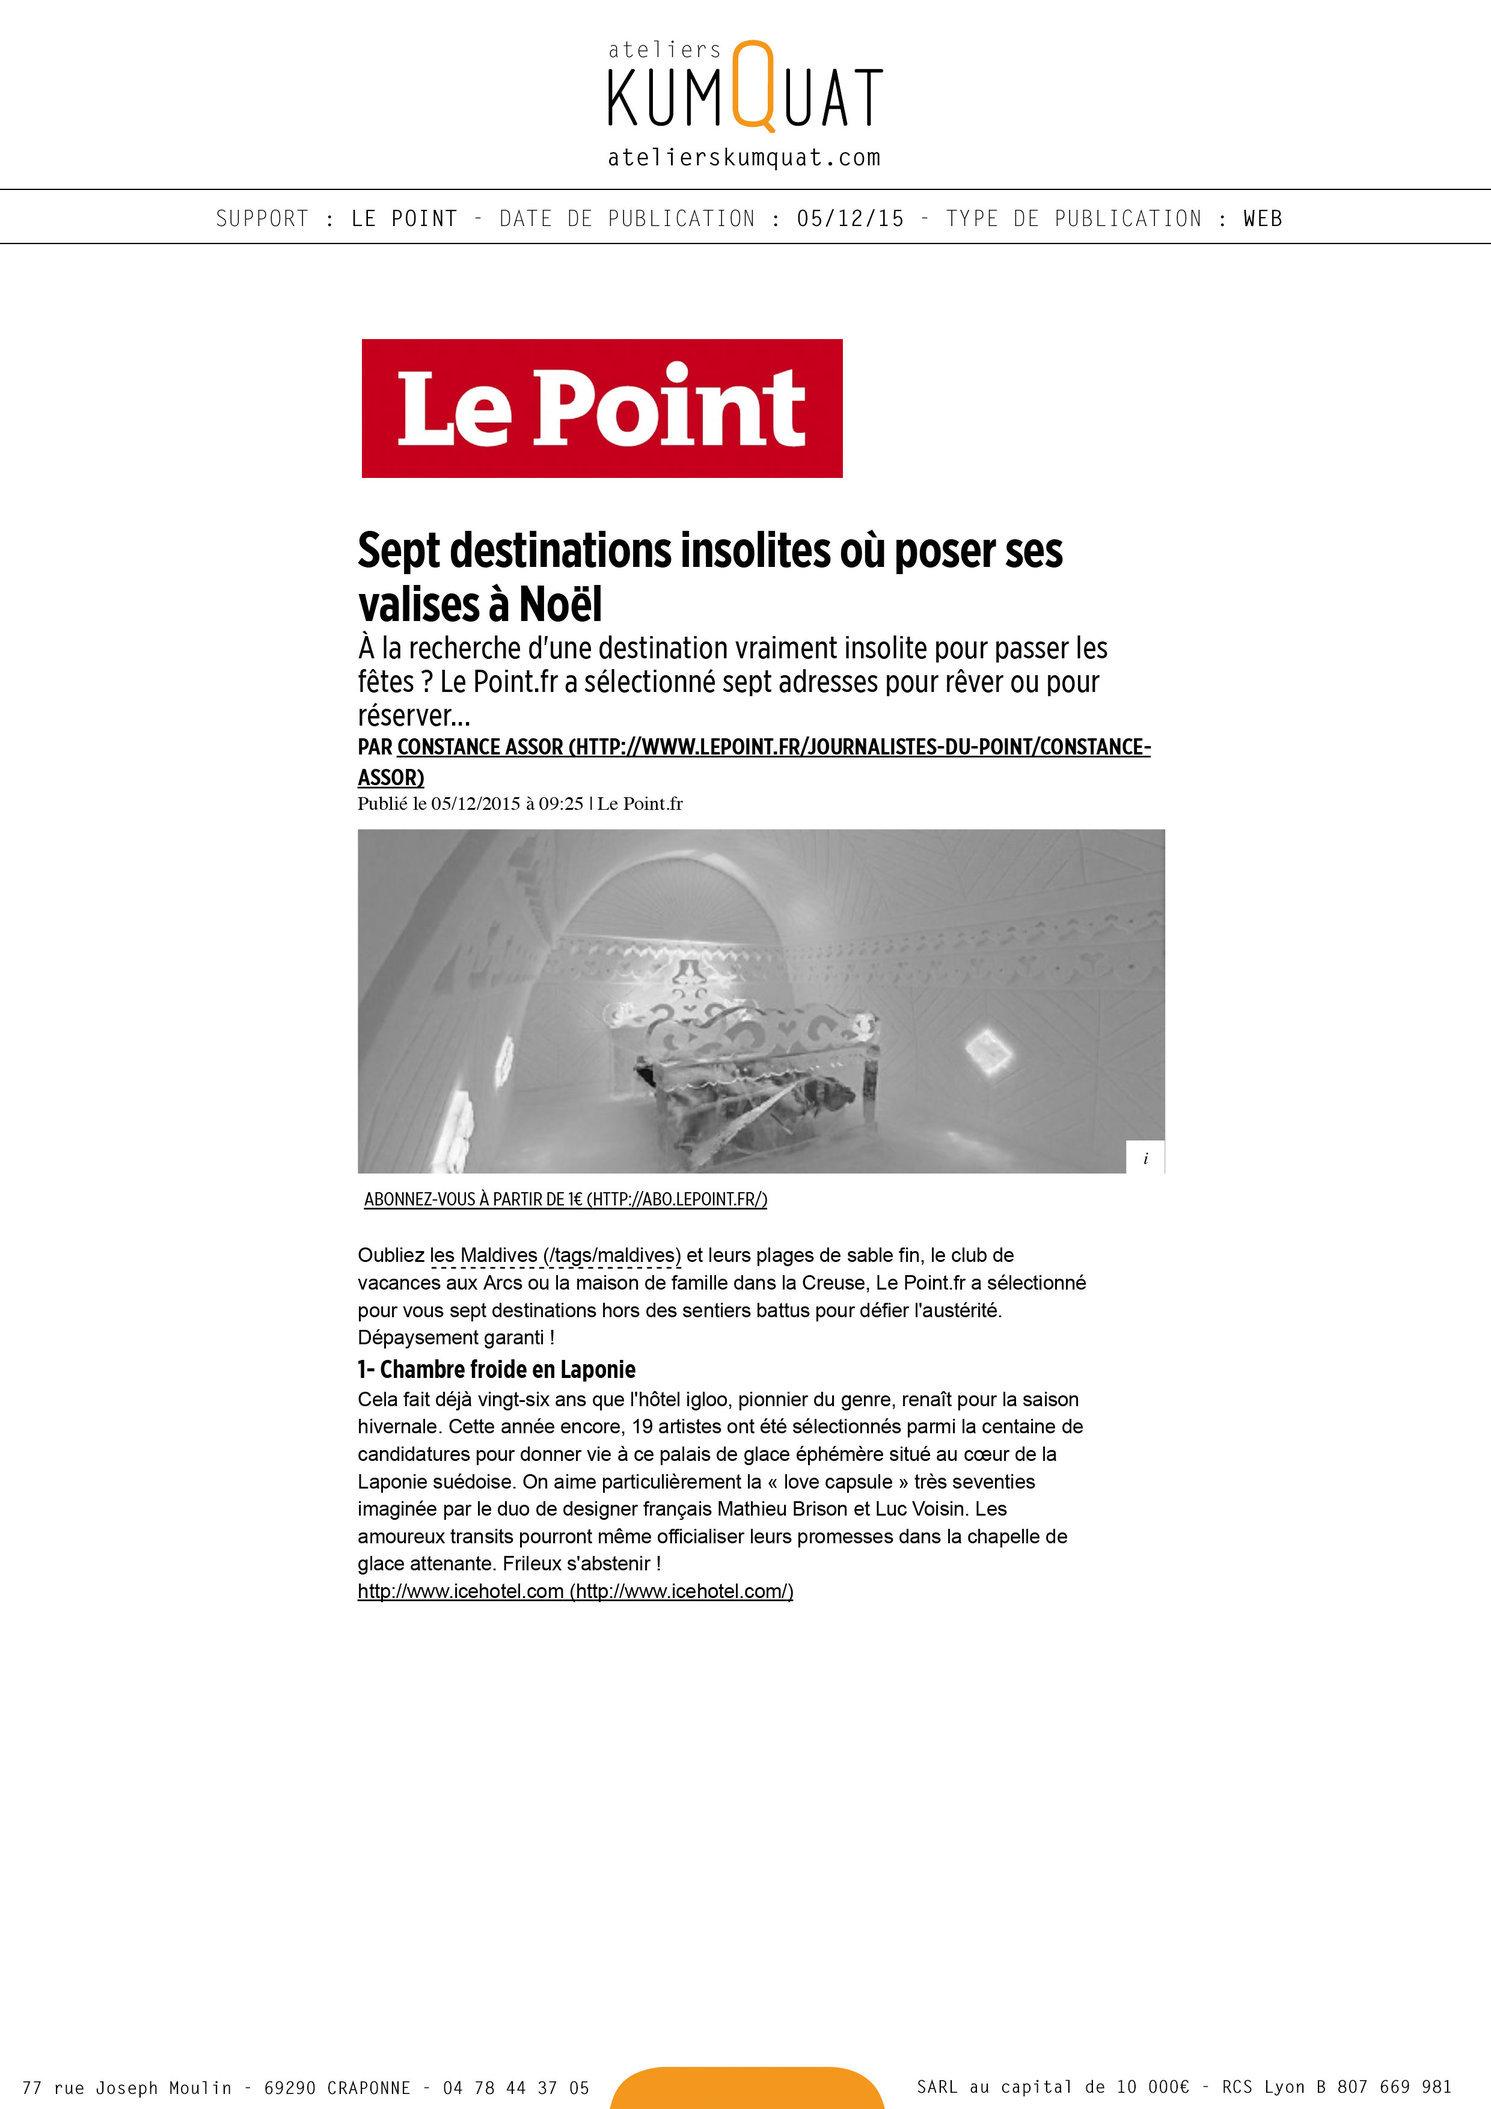 LE POINT - 05/12/15